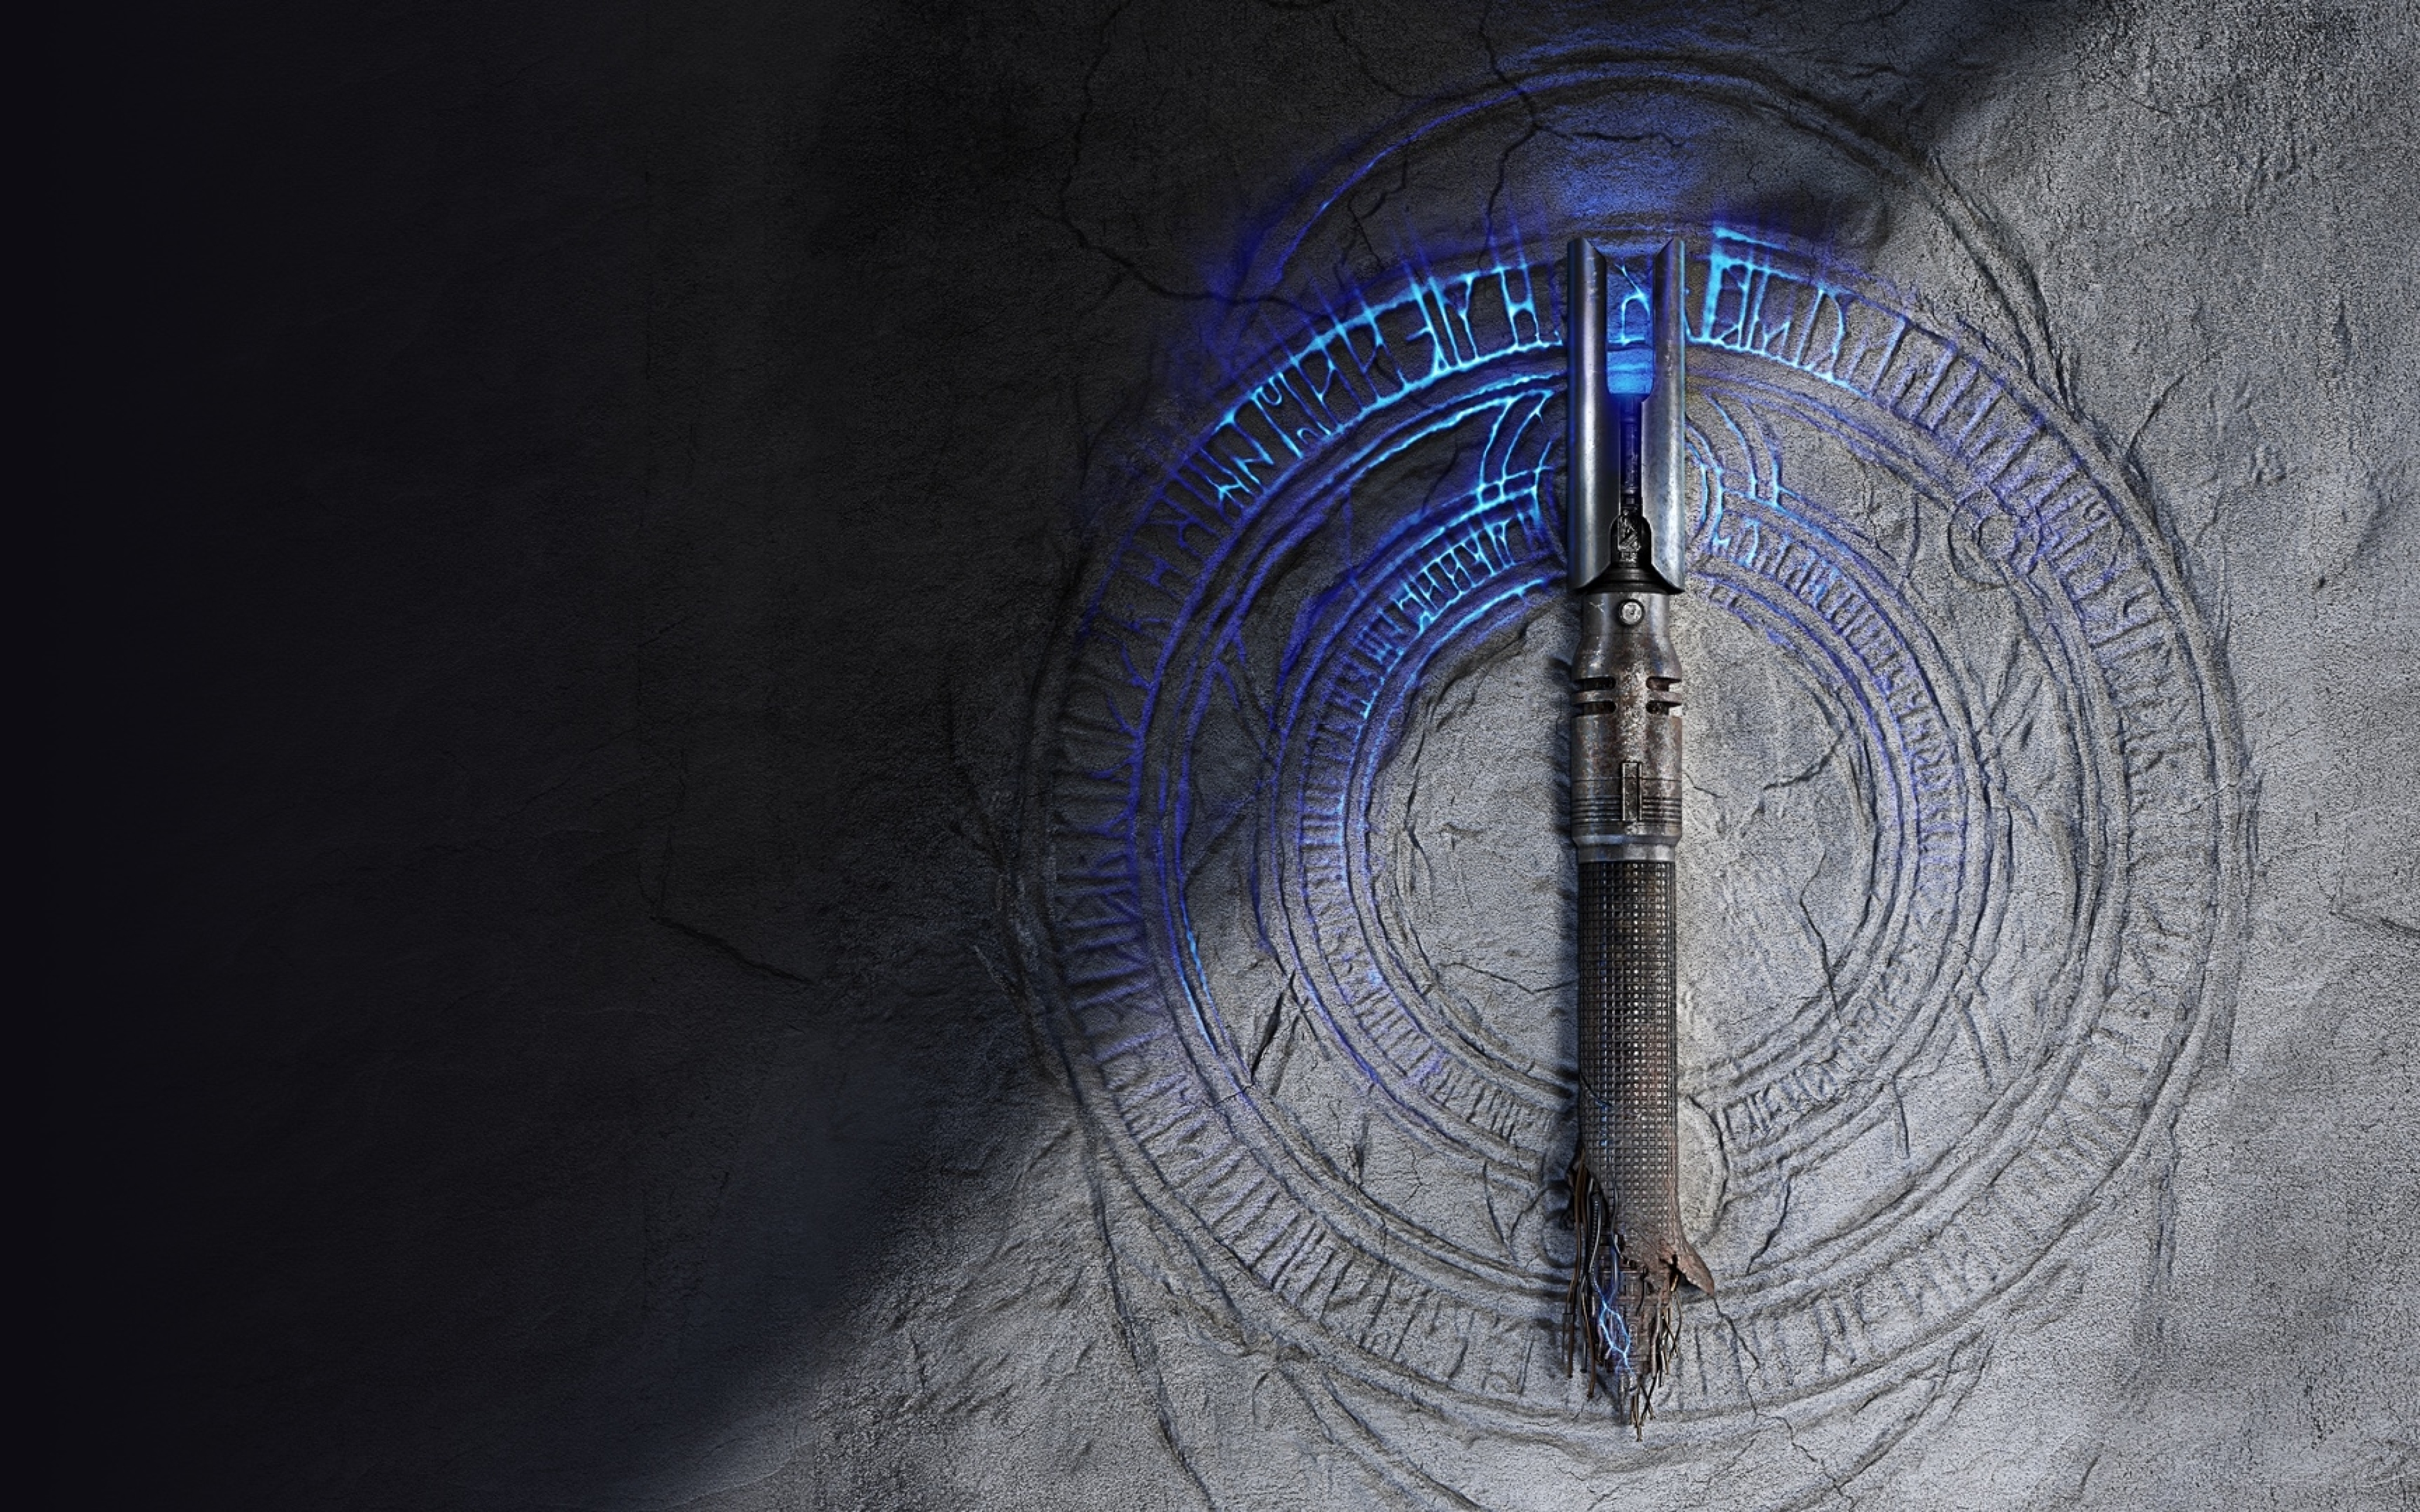 3840x2400 Star Wars Jedi Fallen Order Poster 4K 3840x2400 ...